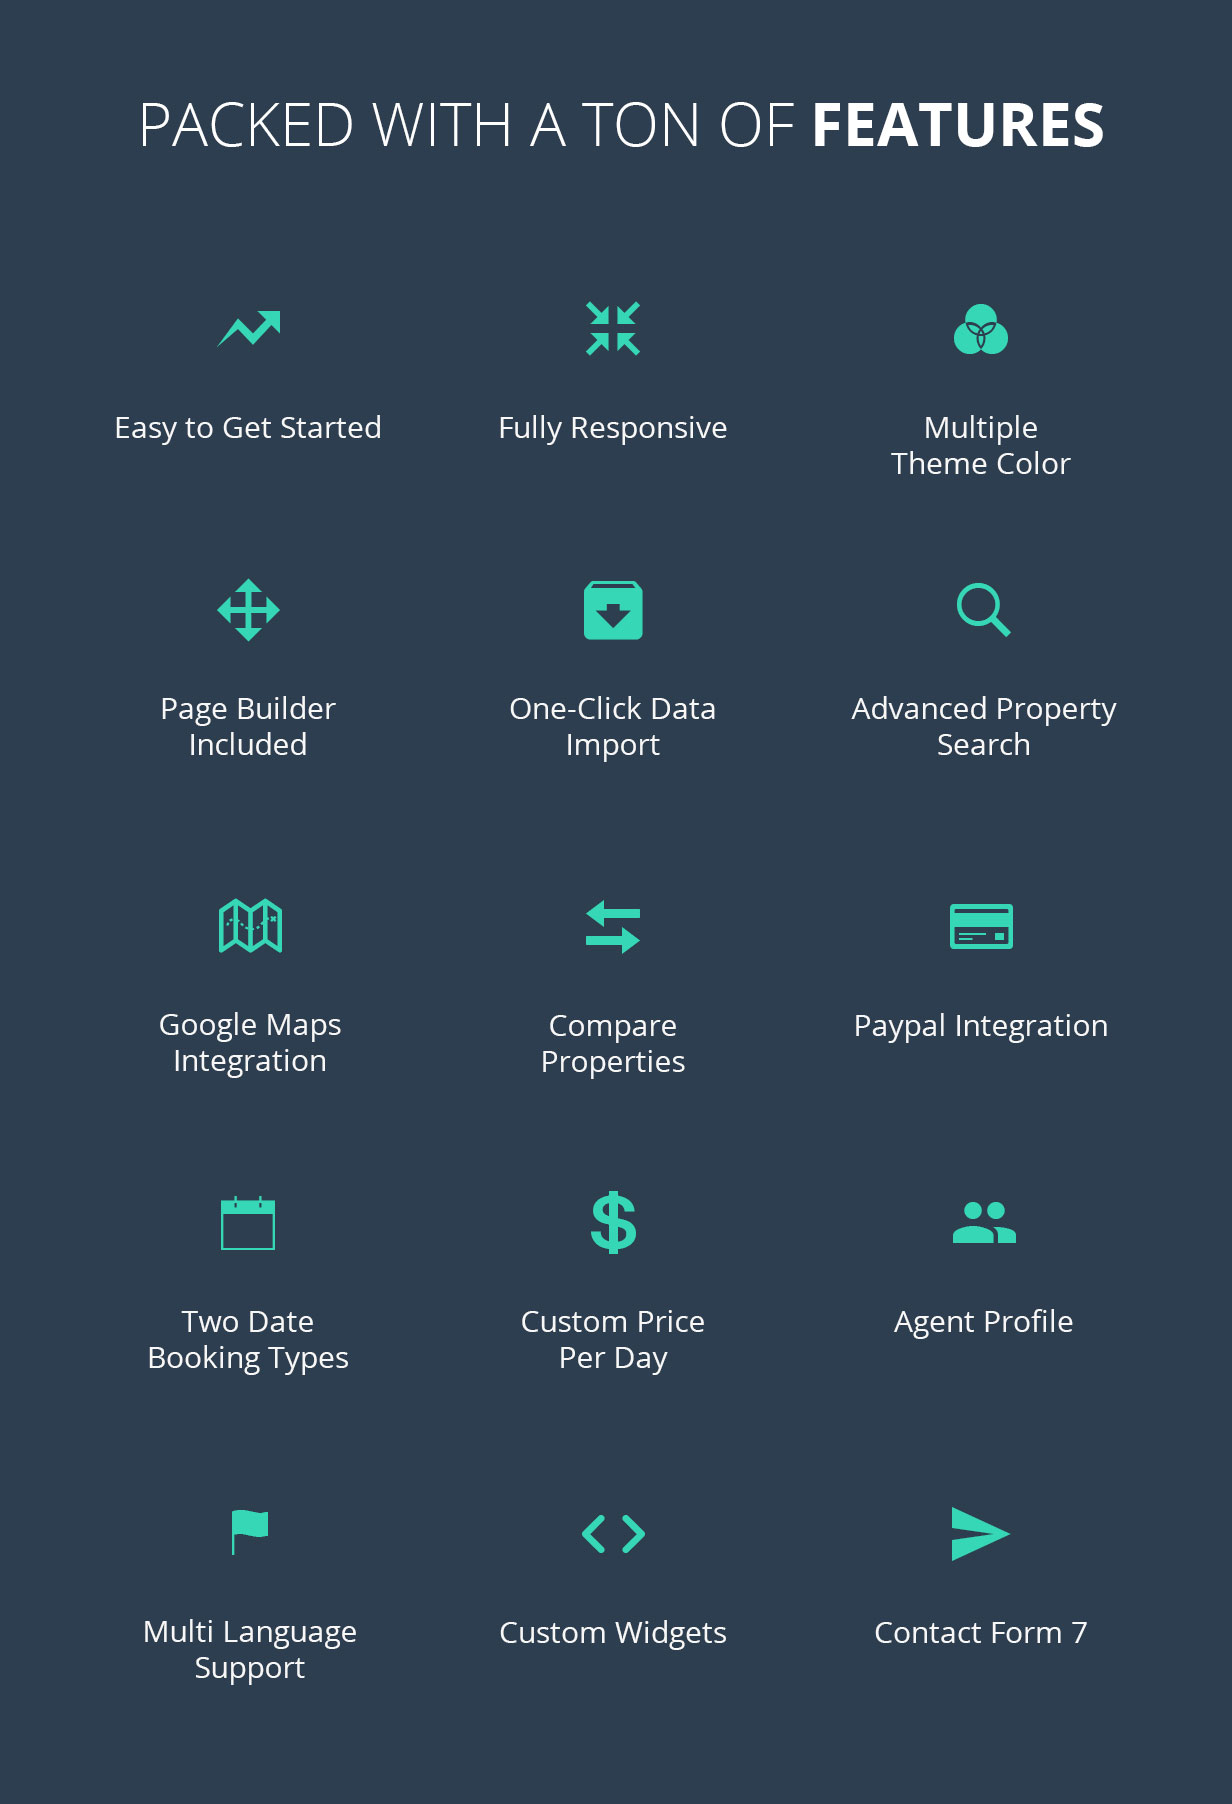 Kensington - Immobilien- und Immobilienmanagement WordPress Theme - 11